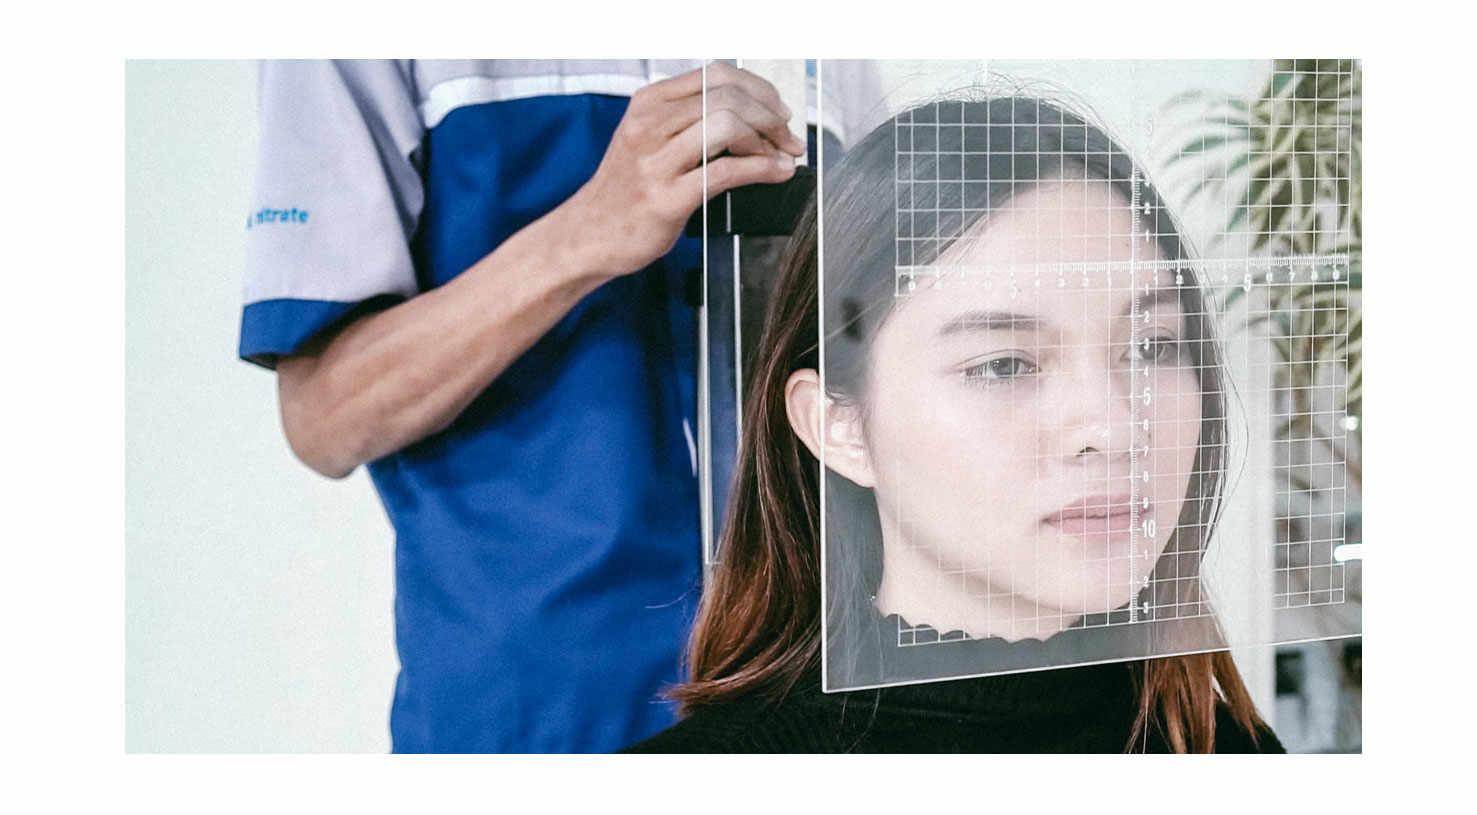 slider-images-pengukuran-wajah1